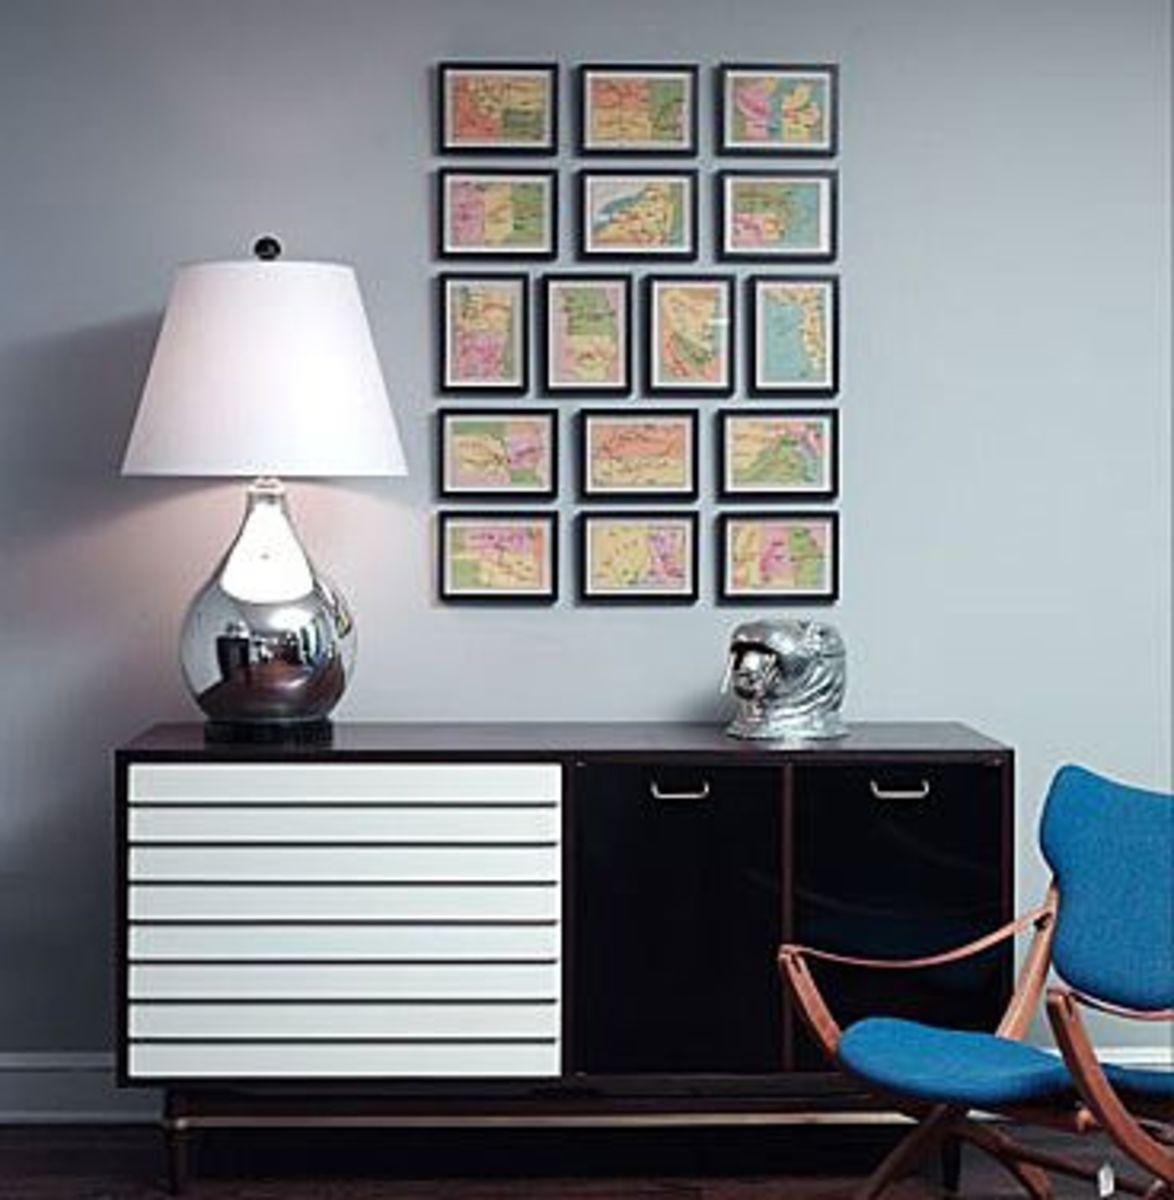 framed-maps-ccflcr-Sterin